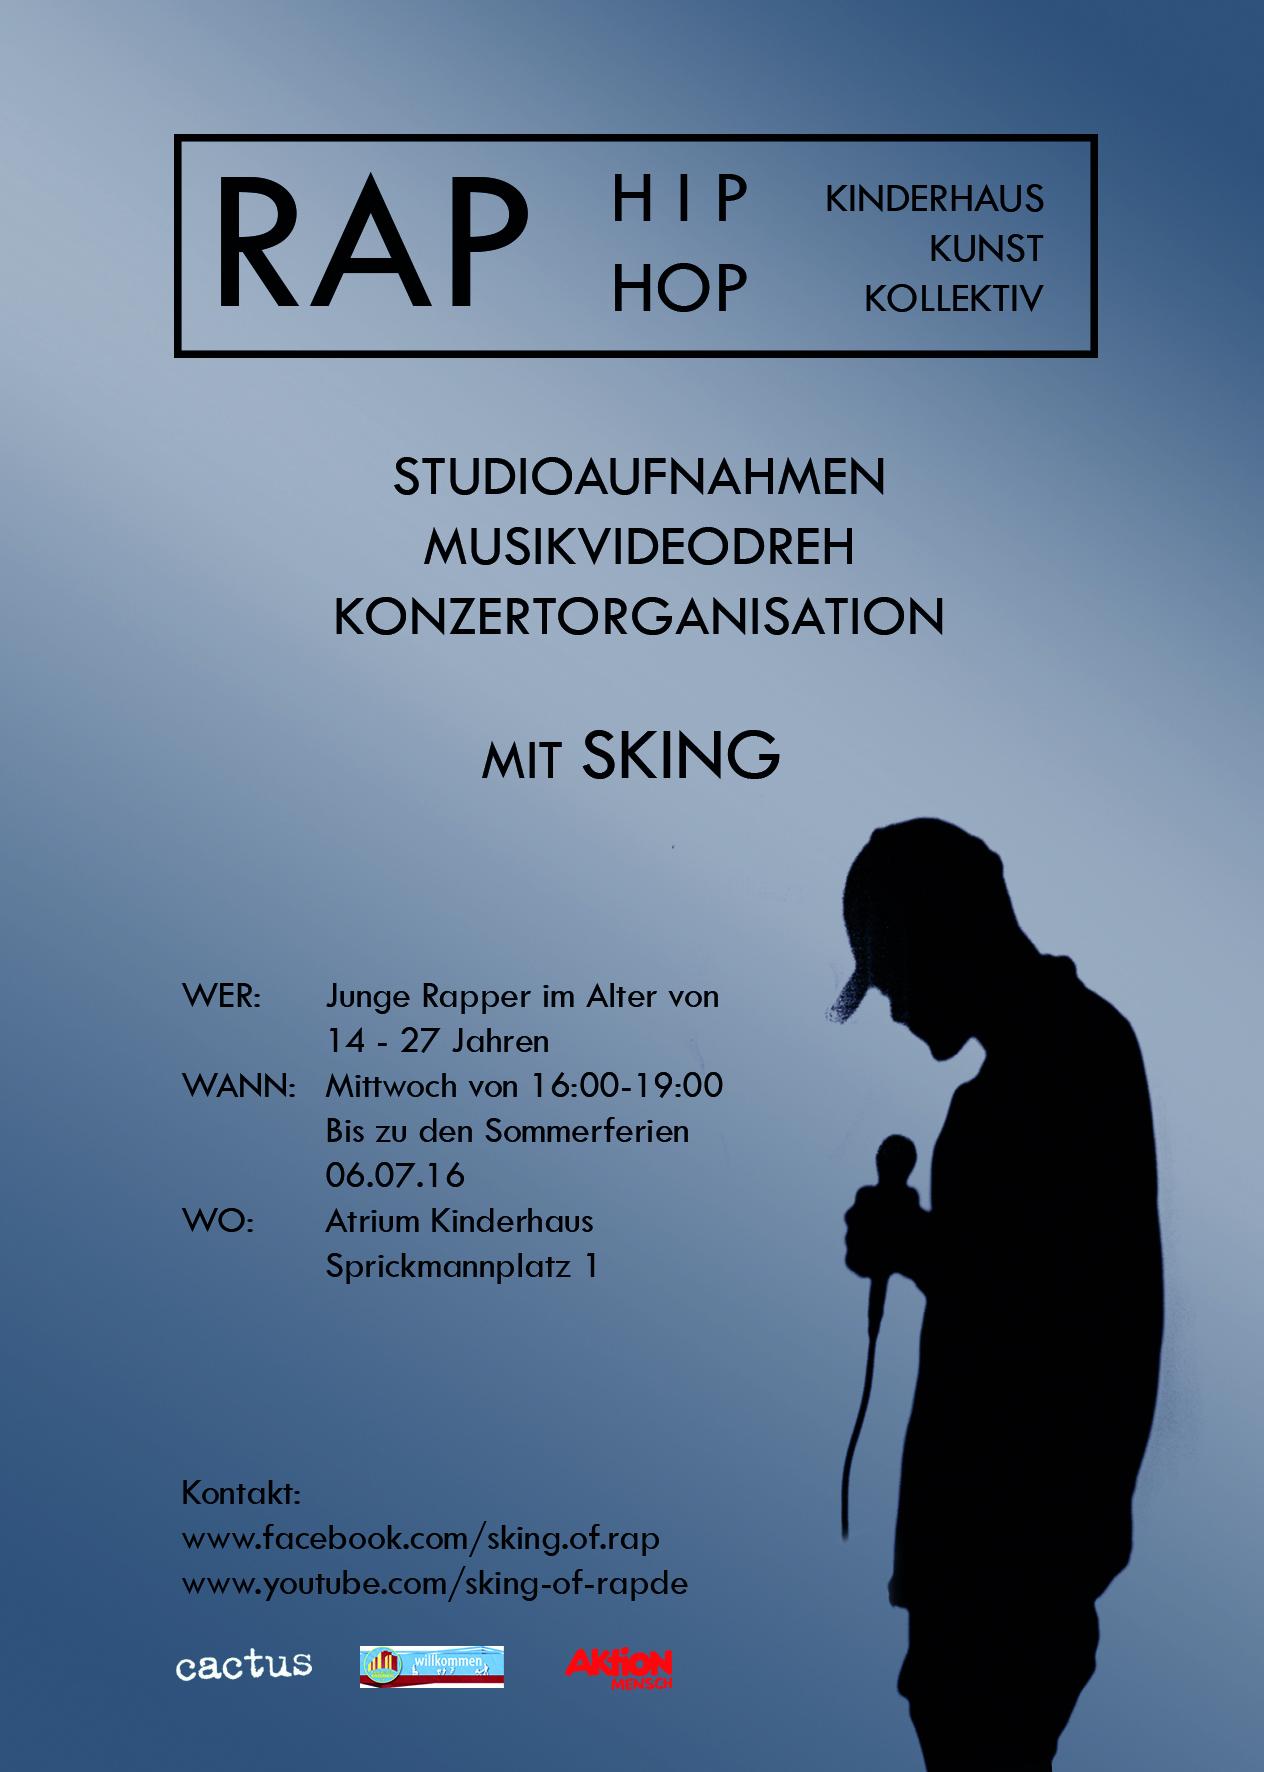 Infoflyer_Kinderhaus_Kunst_Kollektiv_Rap